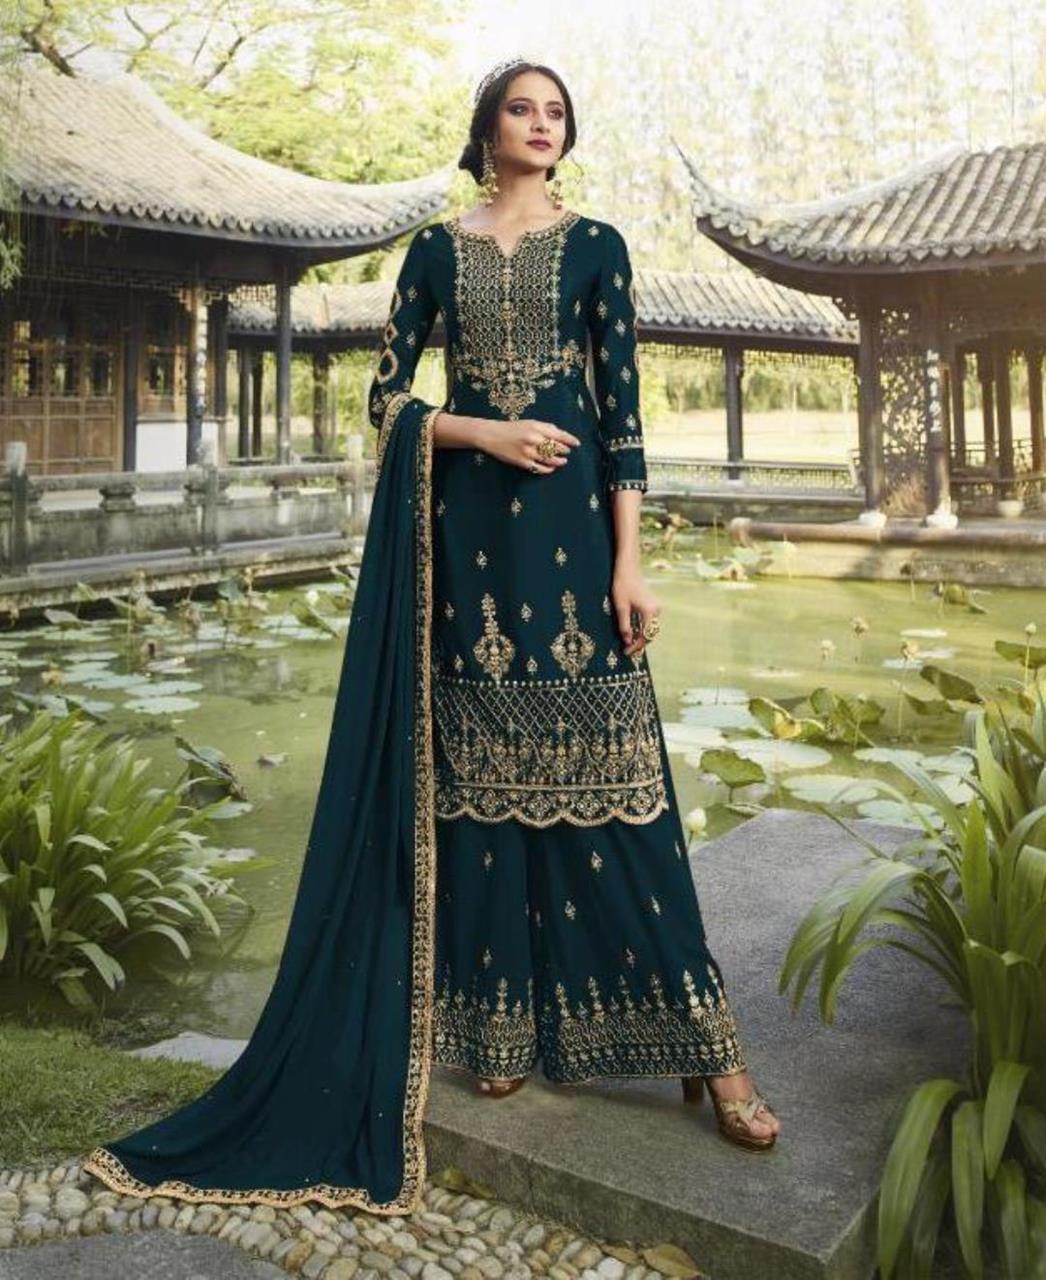 HandWorked Georgette Straight cut Salwar Kameez in Bottel Green